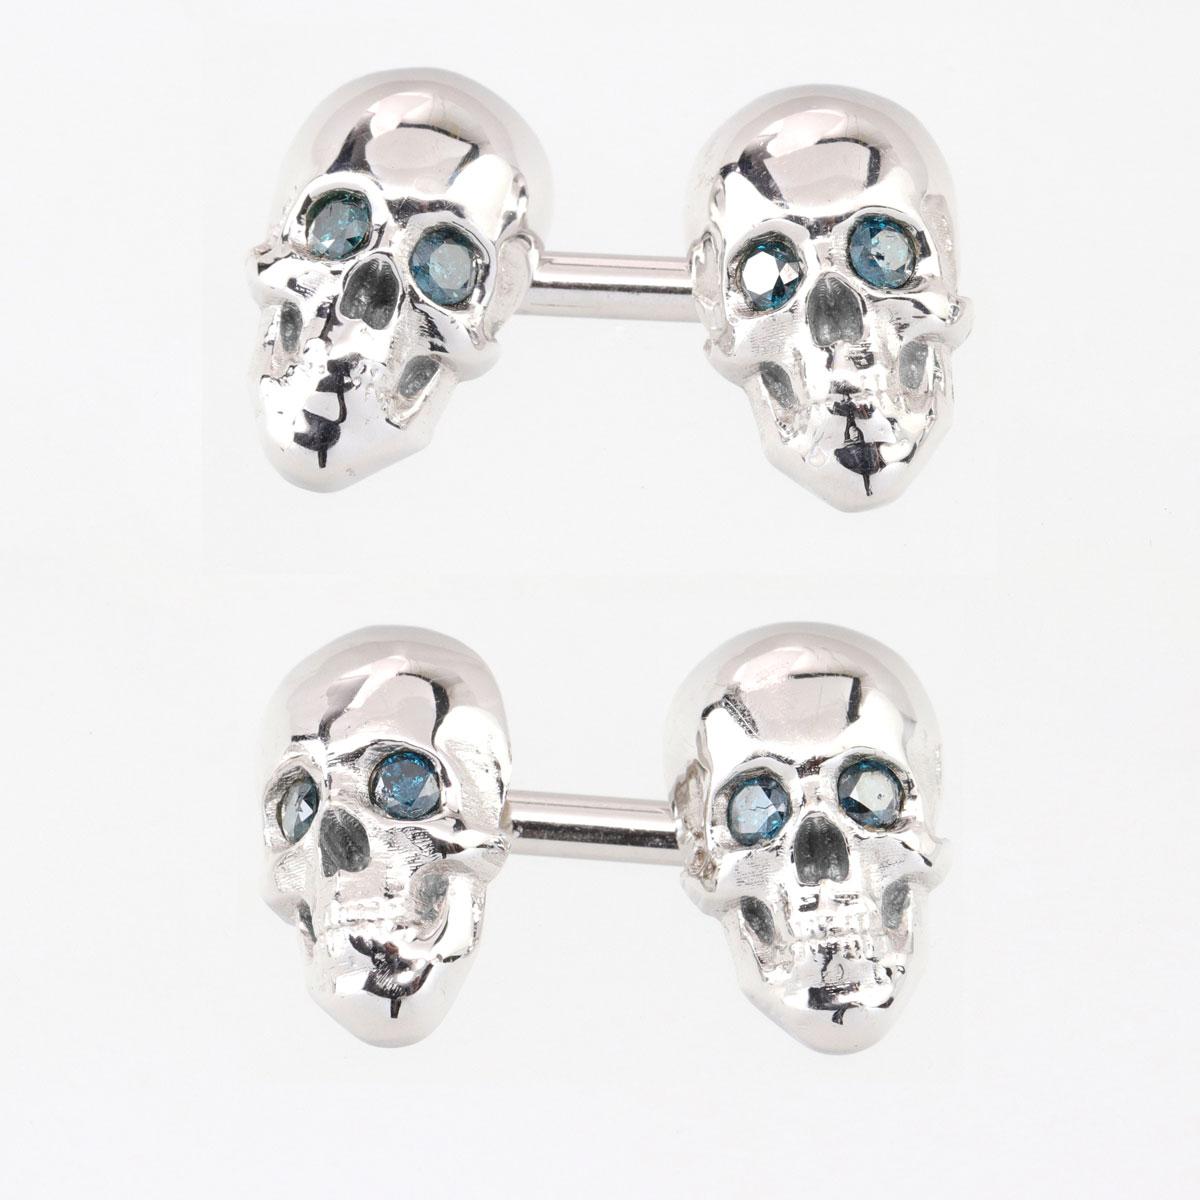 Skull Cuff Links with Blue Diamond Eyes, 14K White Gold